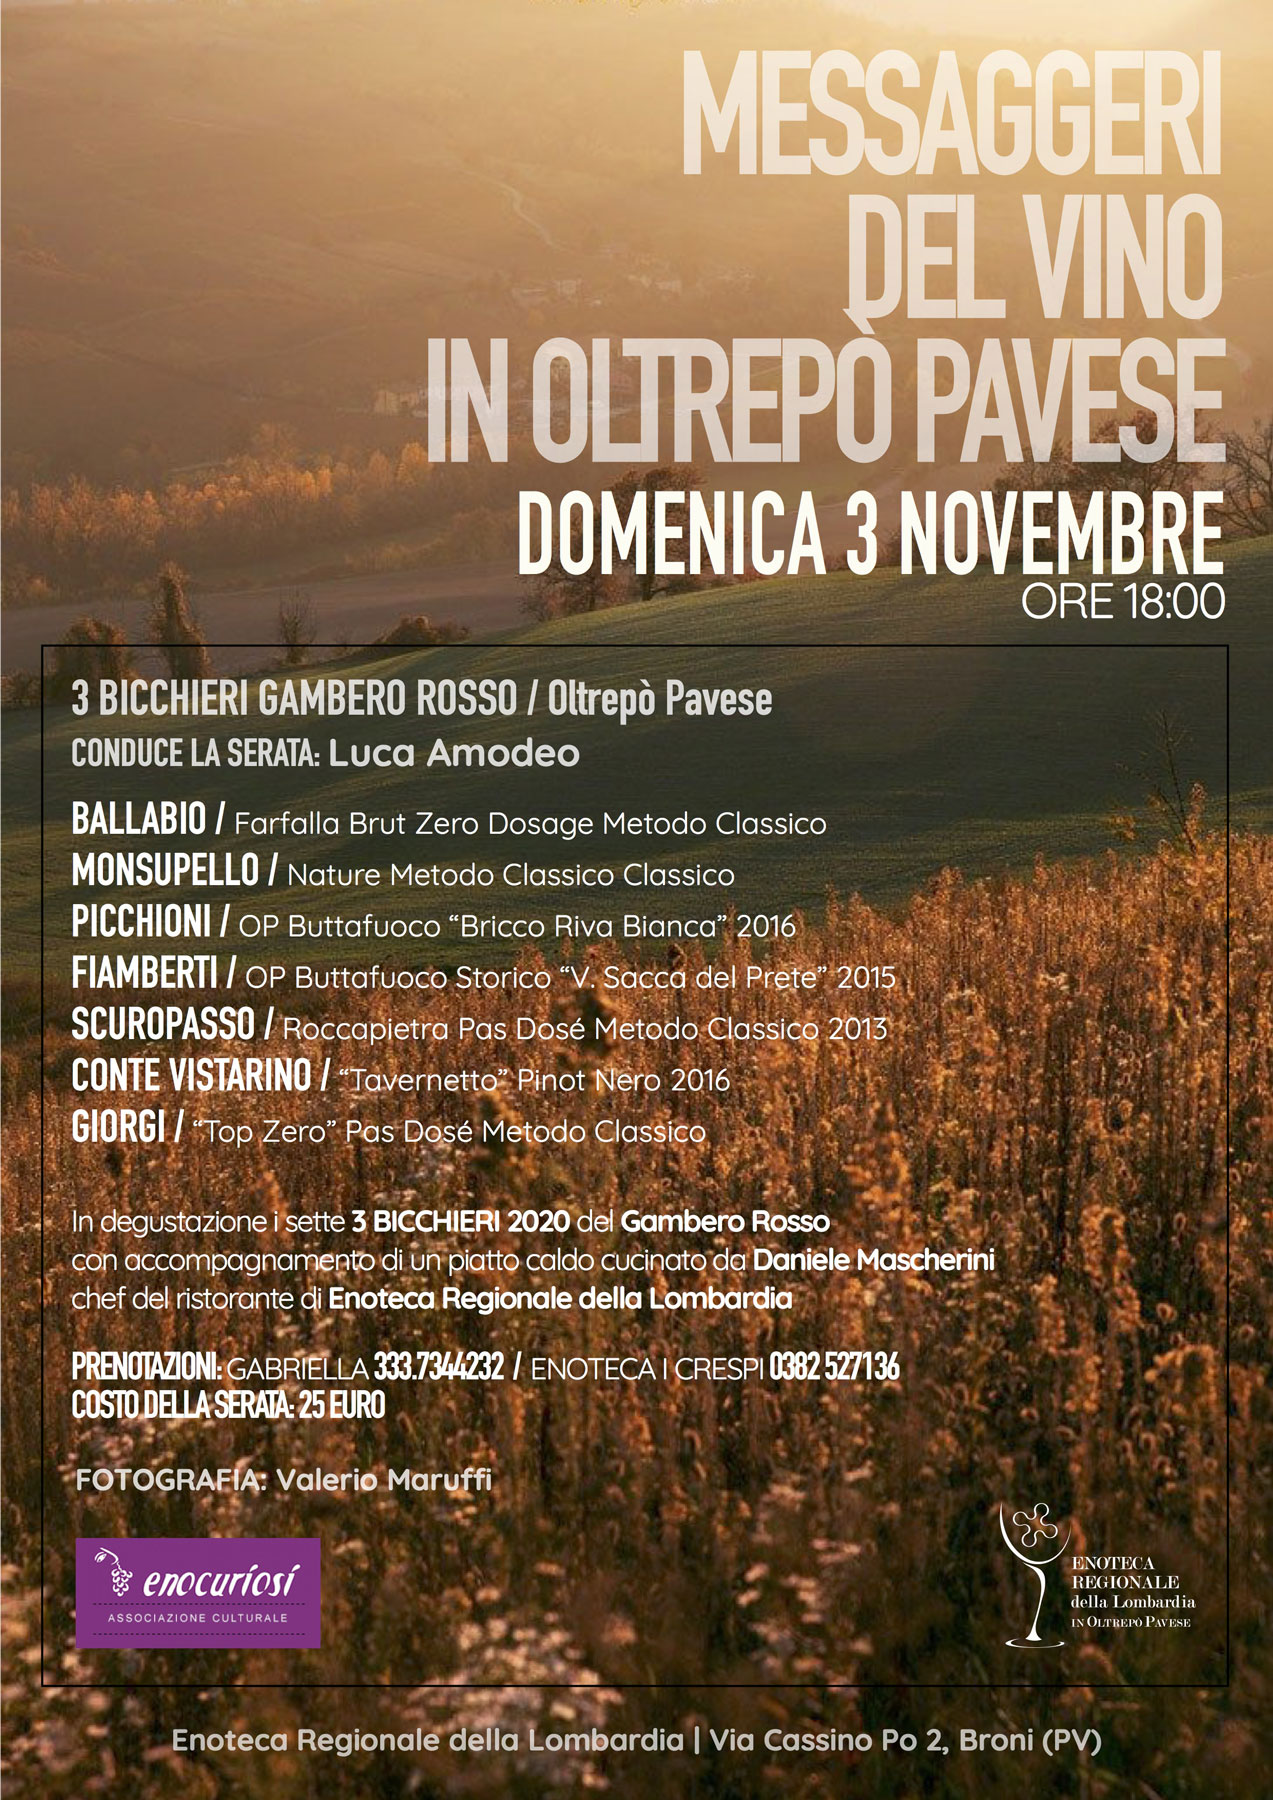 Messaggeri del vino in Oltrepò Pavese